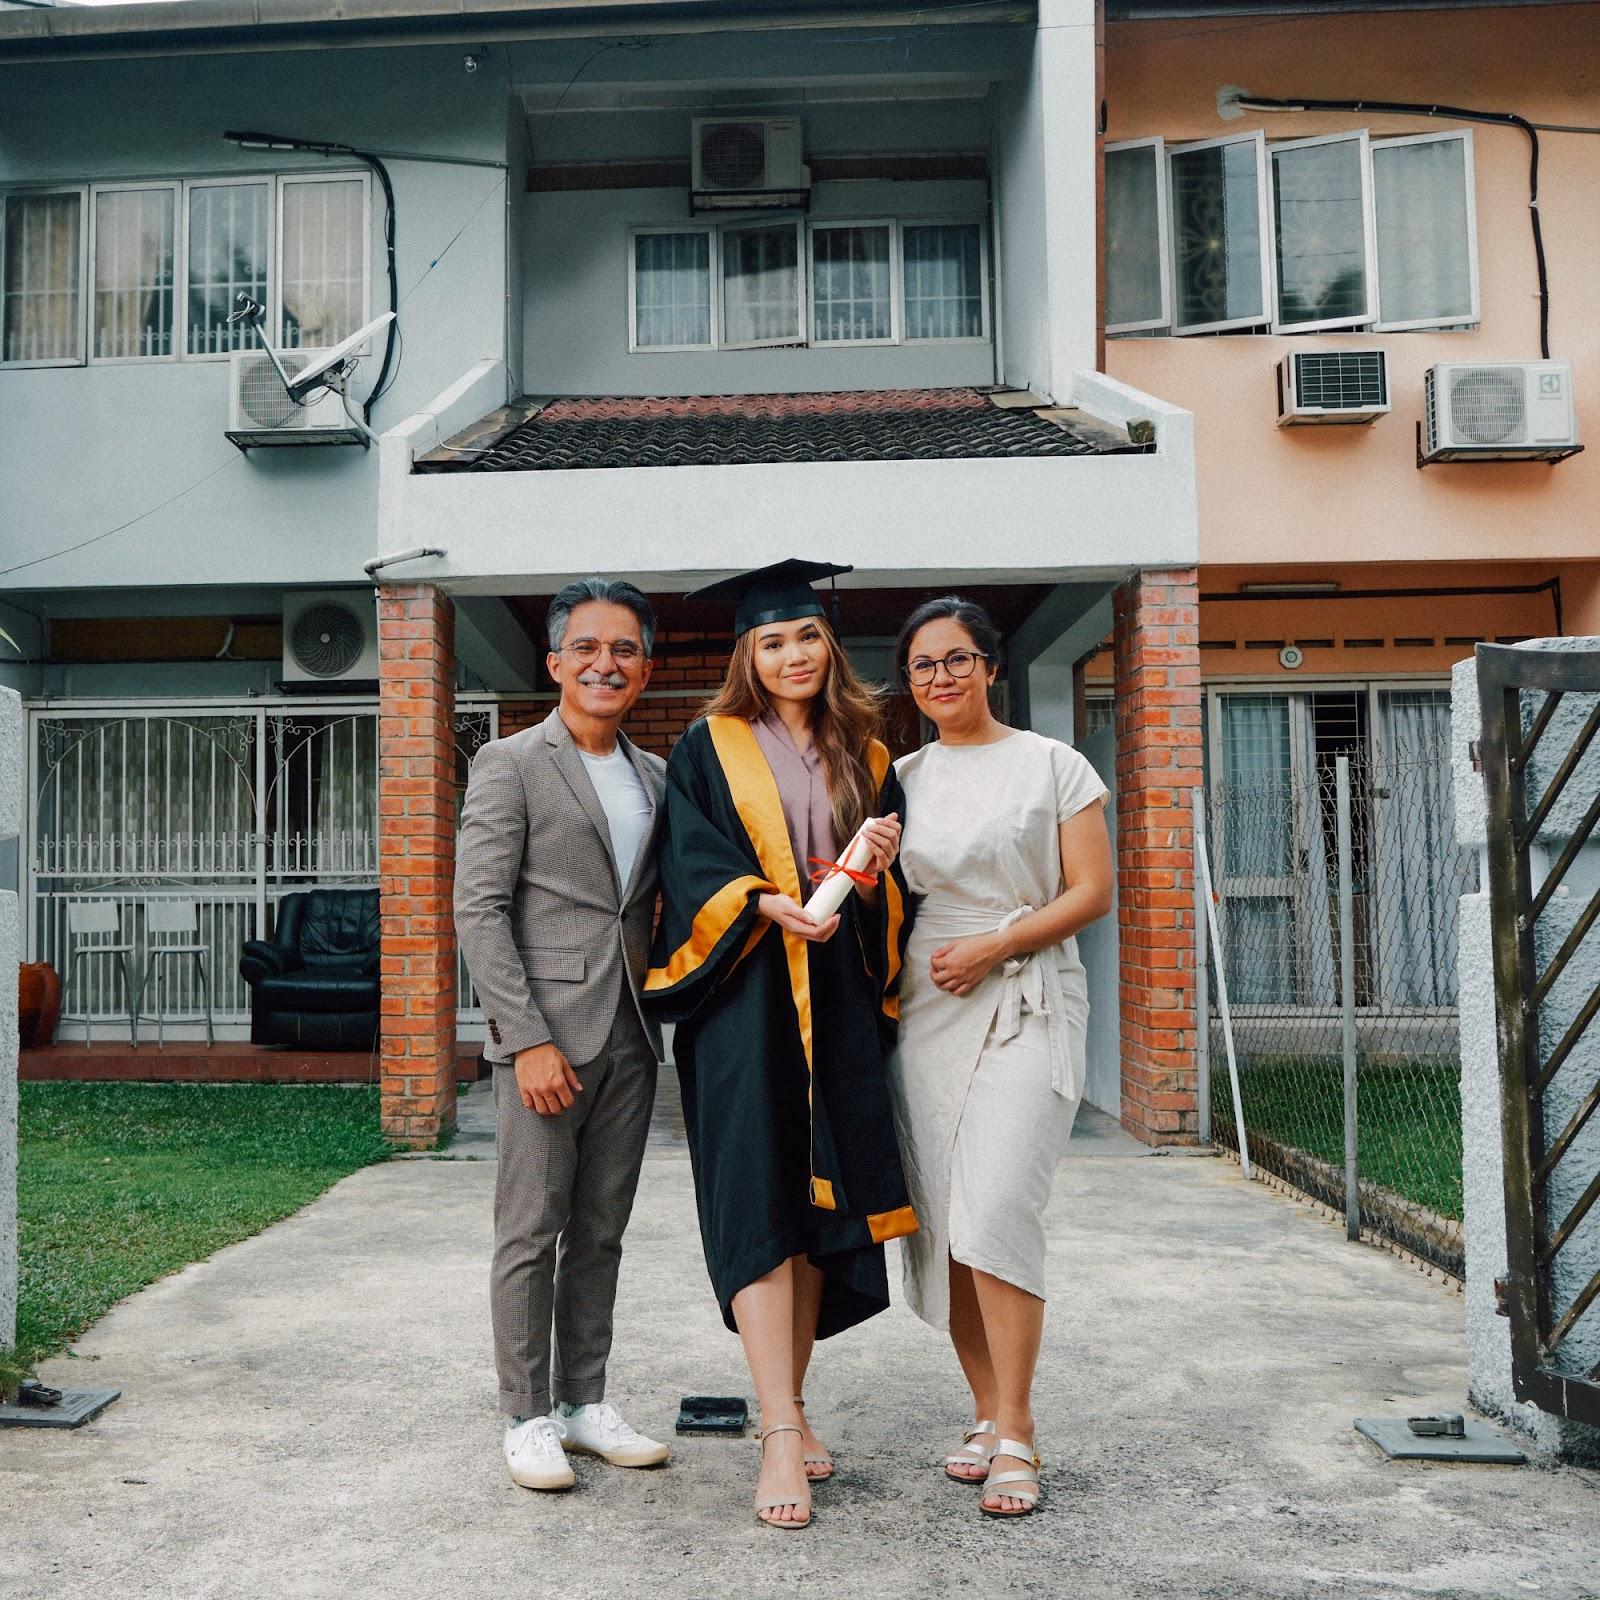 Rumahku Syurgaku! Ini Cara Jadikan Luar & Dalam Rumah Selamat Untuk Keluarga Tersayang Diami 9